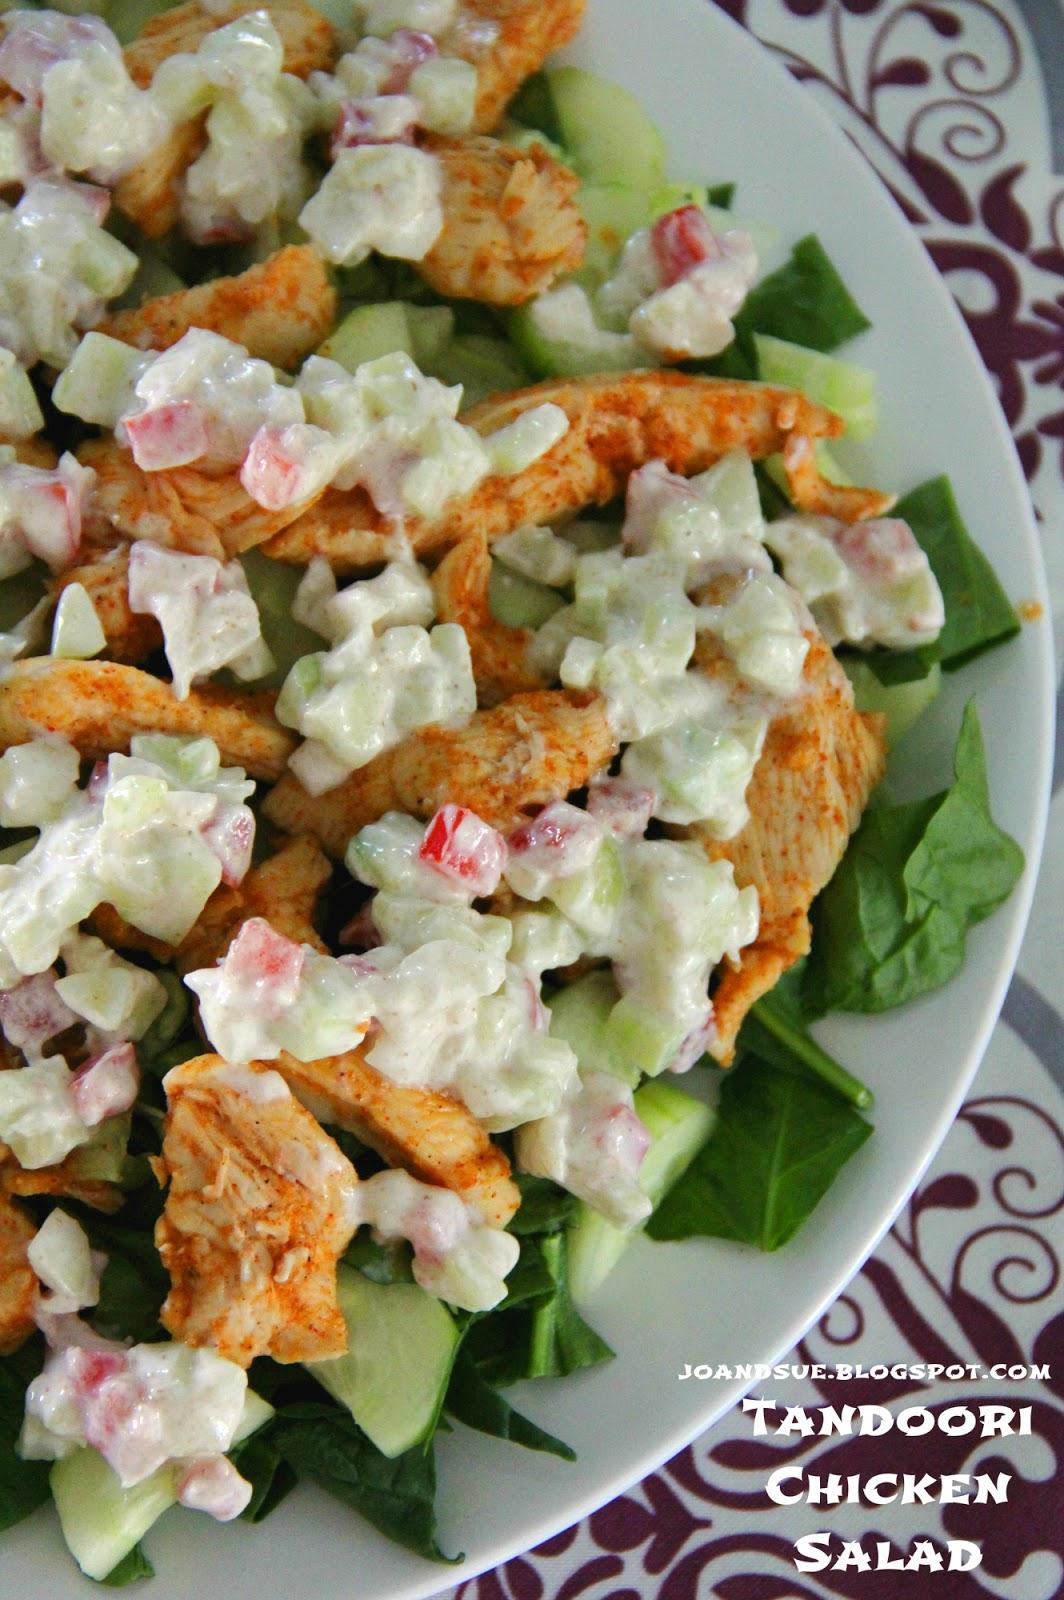 Jo and Sue: Tandoori Chicken Salad With Tomato and Cucumber Raita